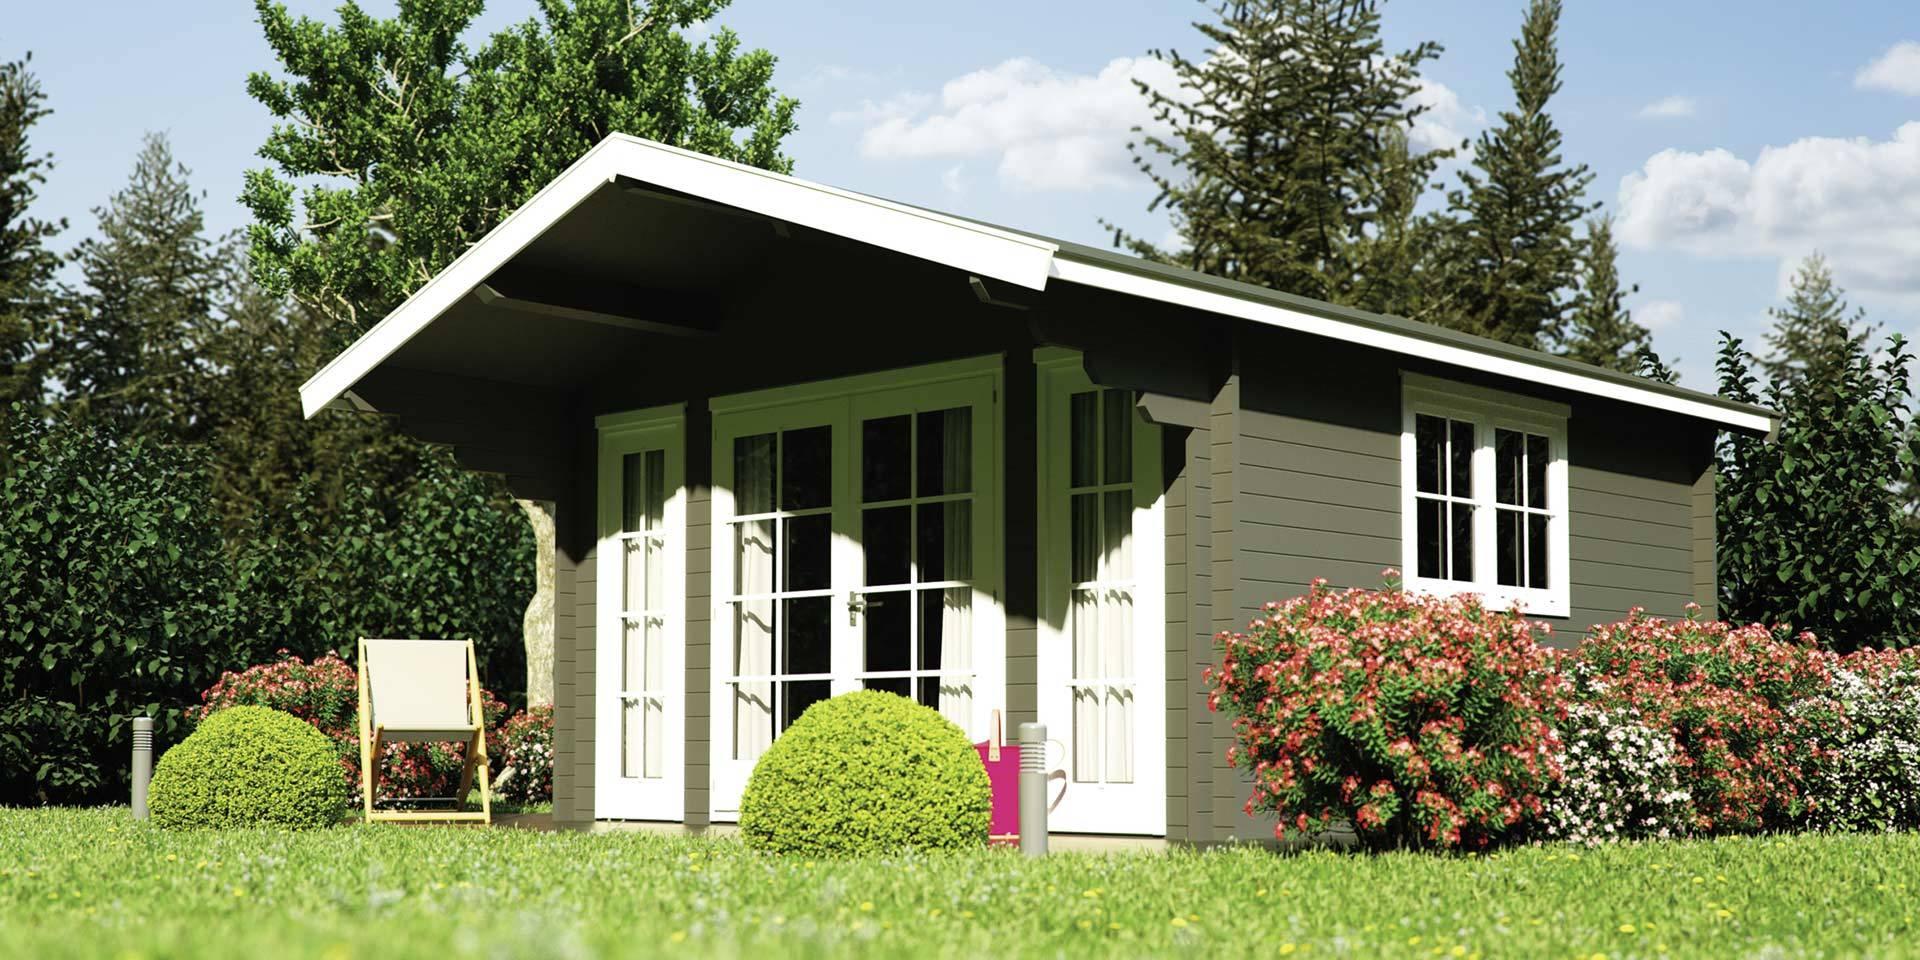 Moderna Gartenhäuser können multifunktional sein